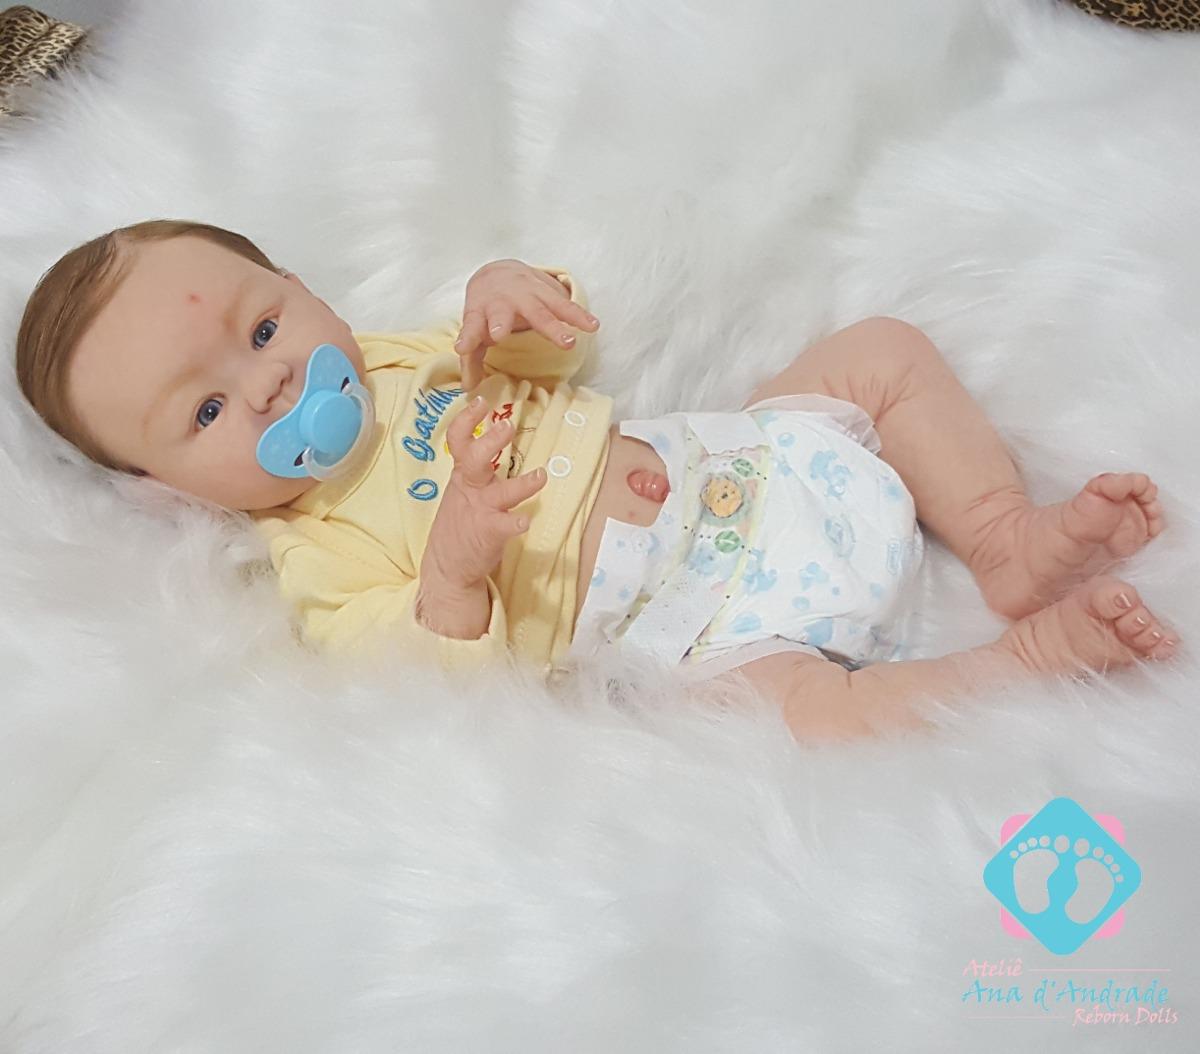 875960d0d bebe reborn menino guilherme corpo inteiro em vinil. Carregando zoom.